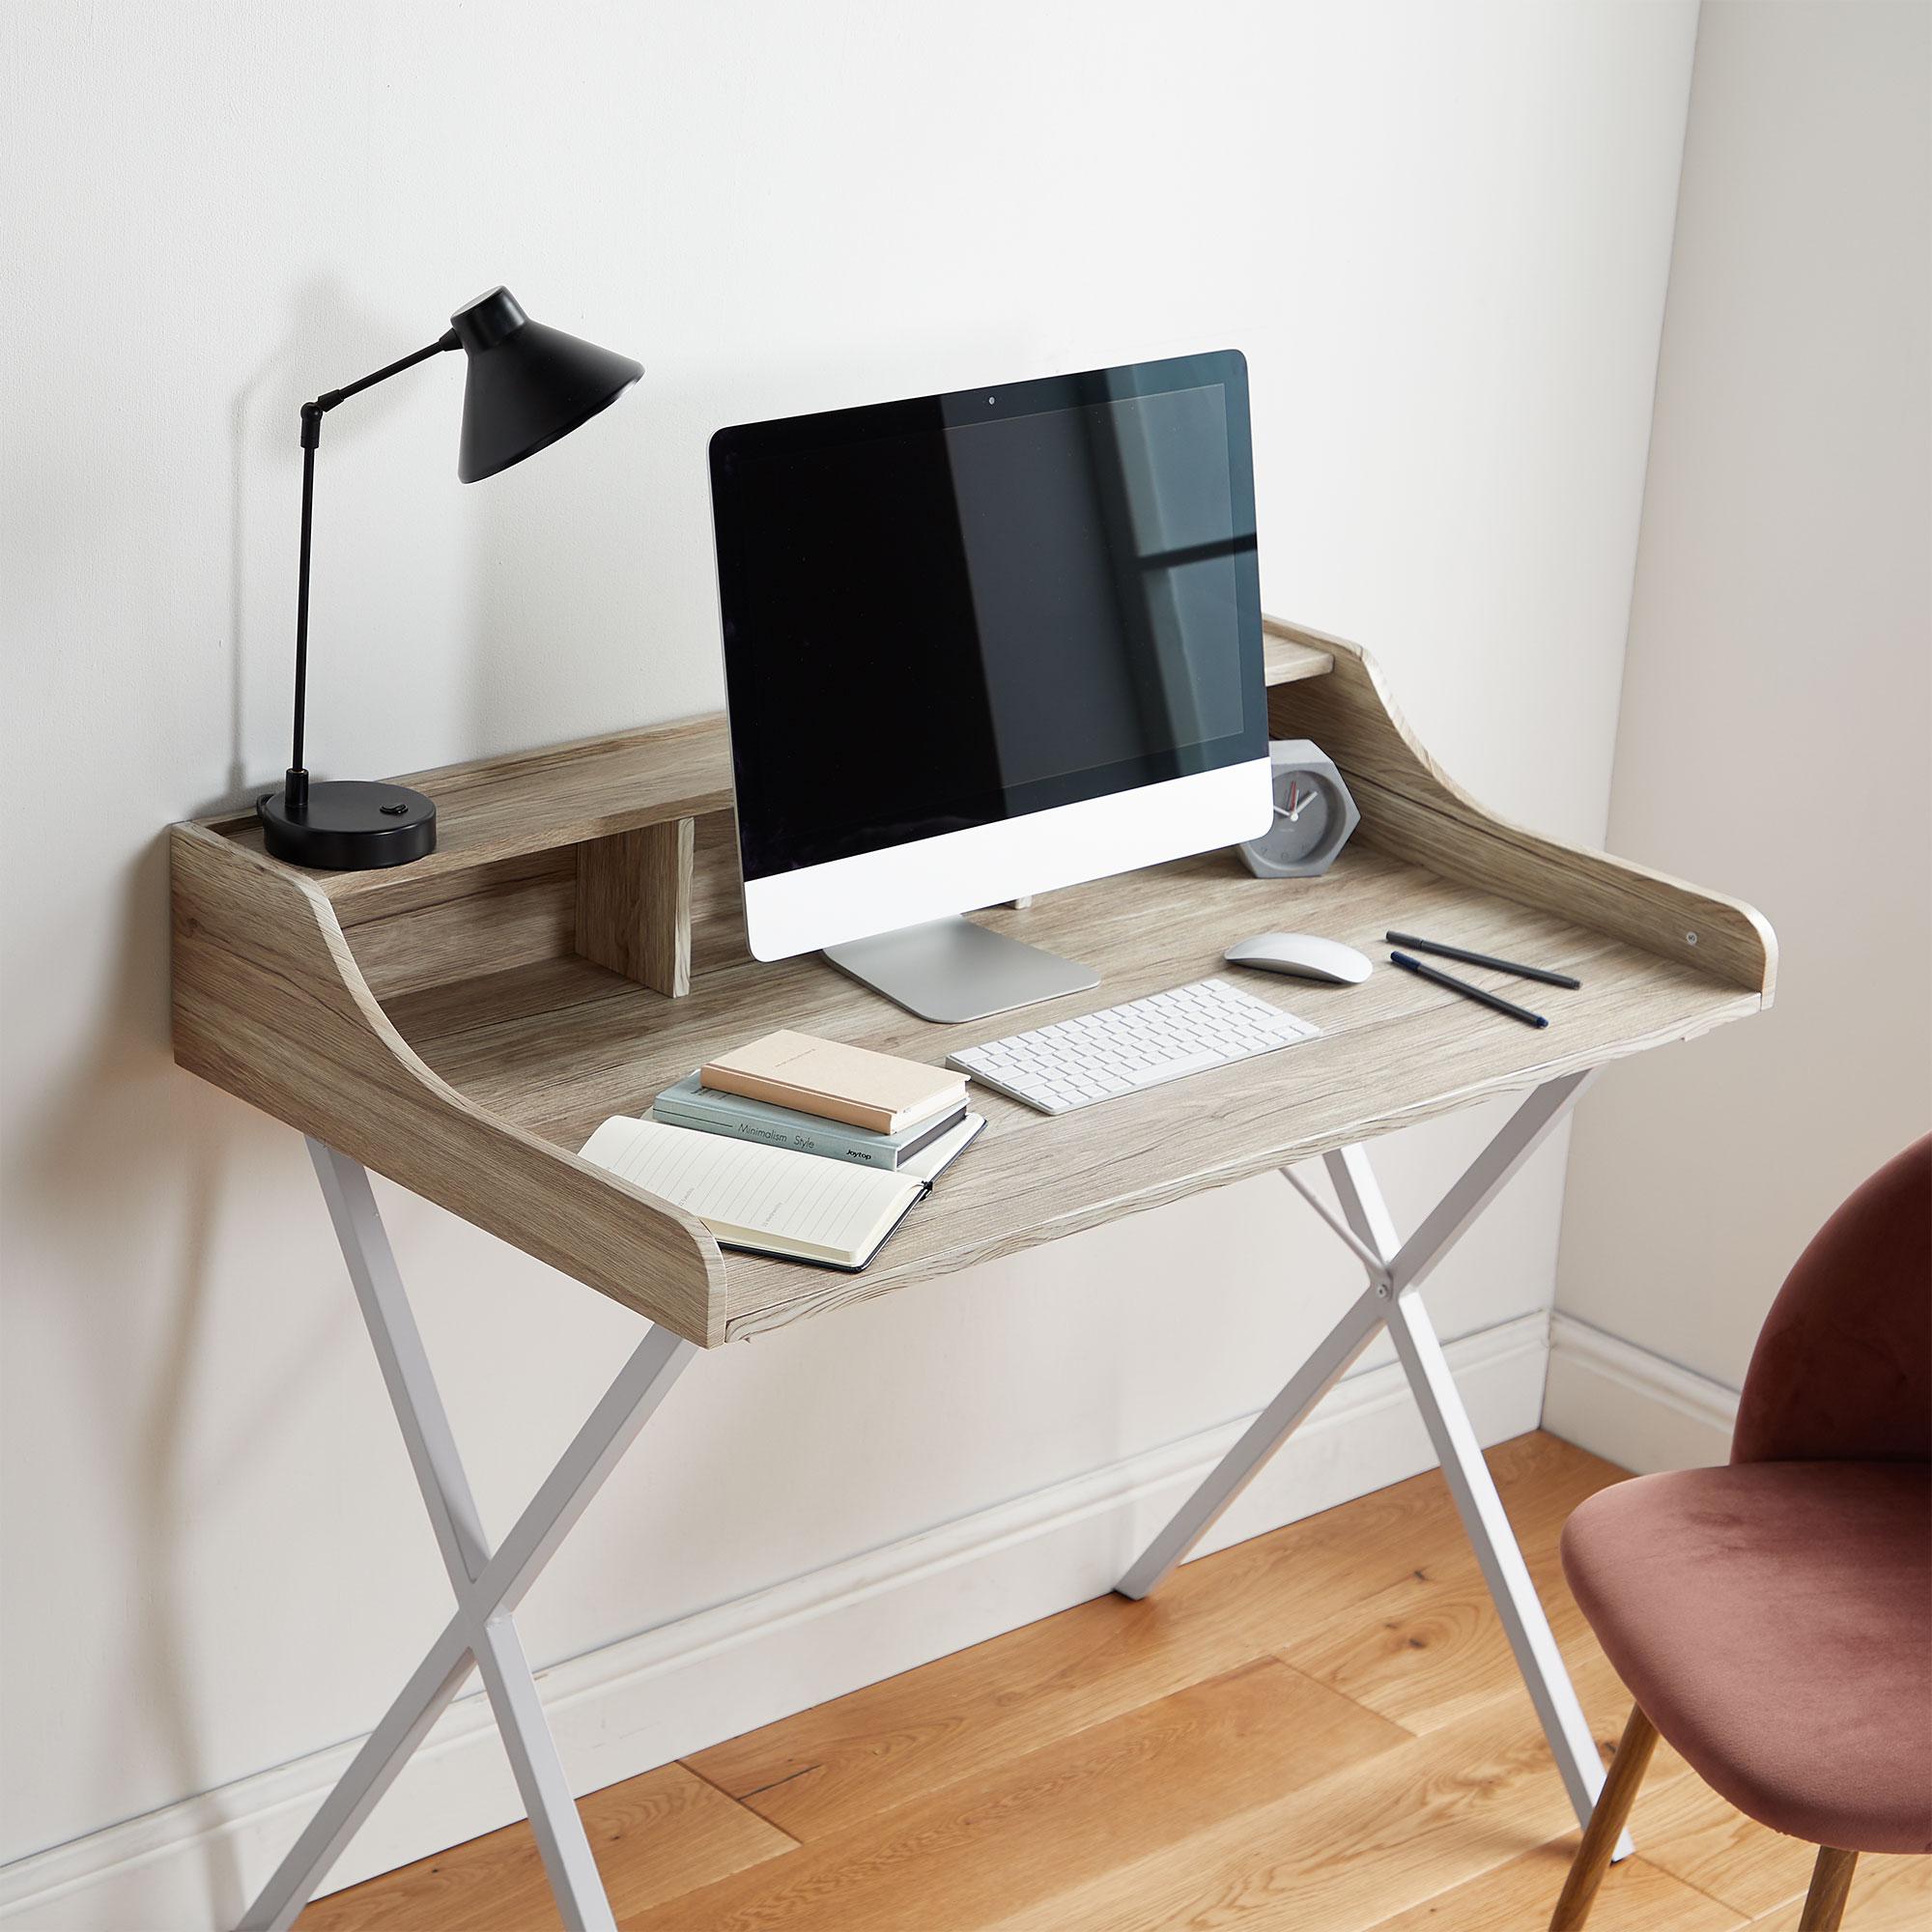 Home Office Furniture Uk Desk Set 18: VonHaus Study Desk White Modern Style Workstation Home